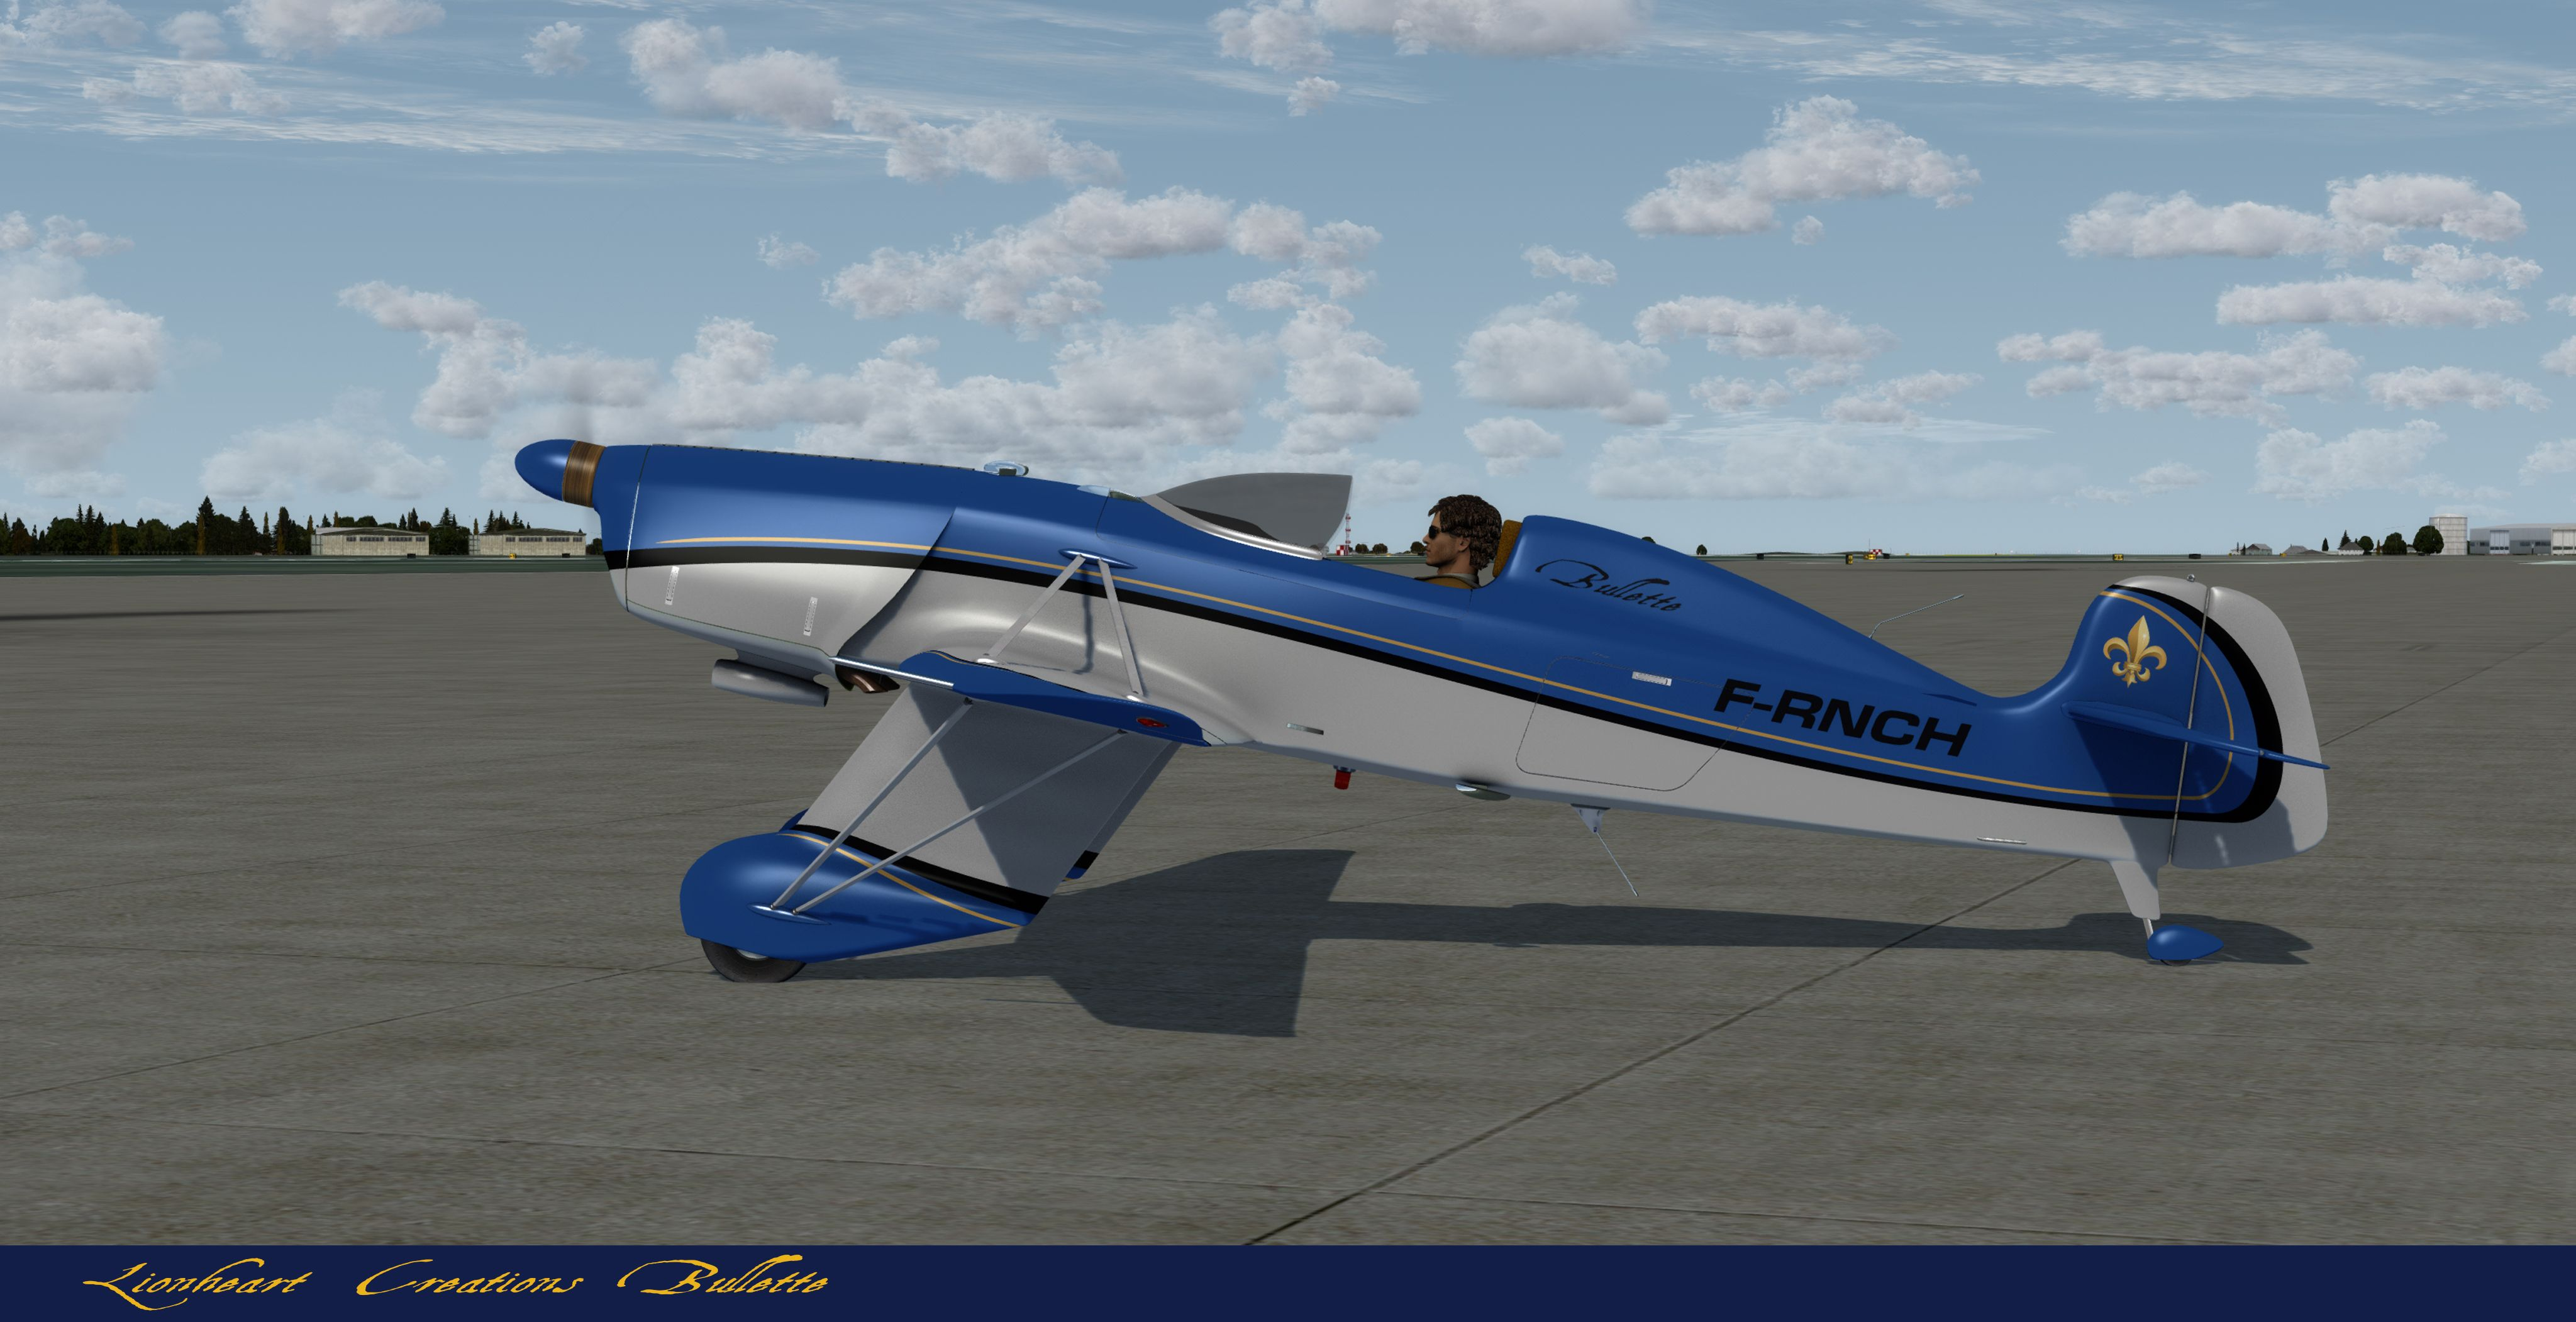 Blue And Gray Proton Bullette Aircraft Design Protons Flight Simulator